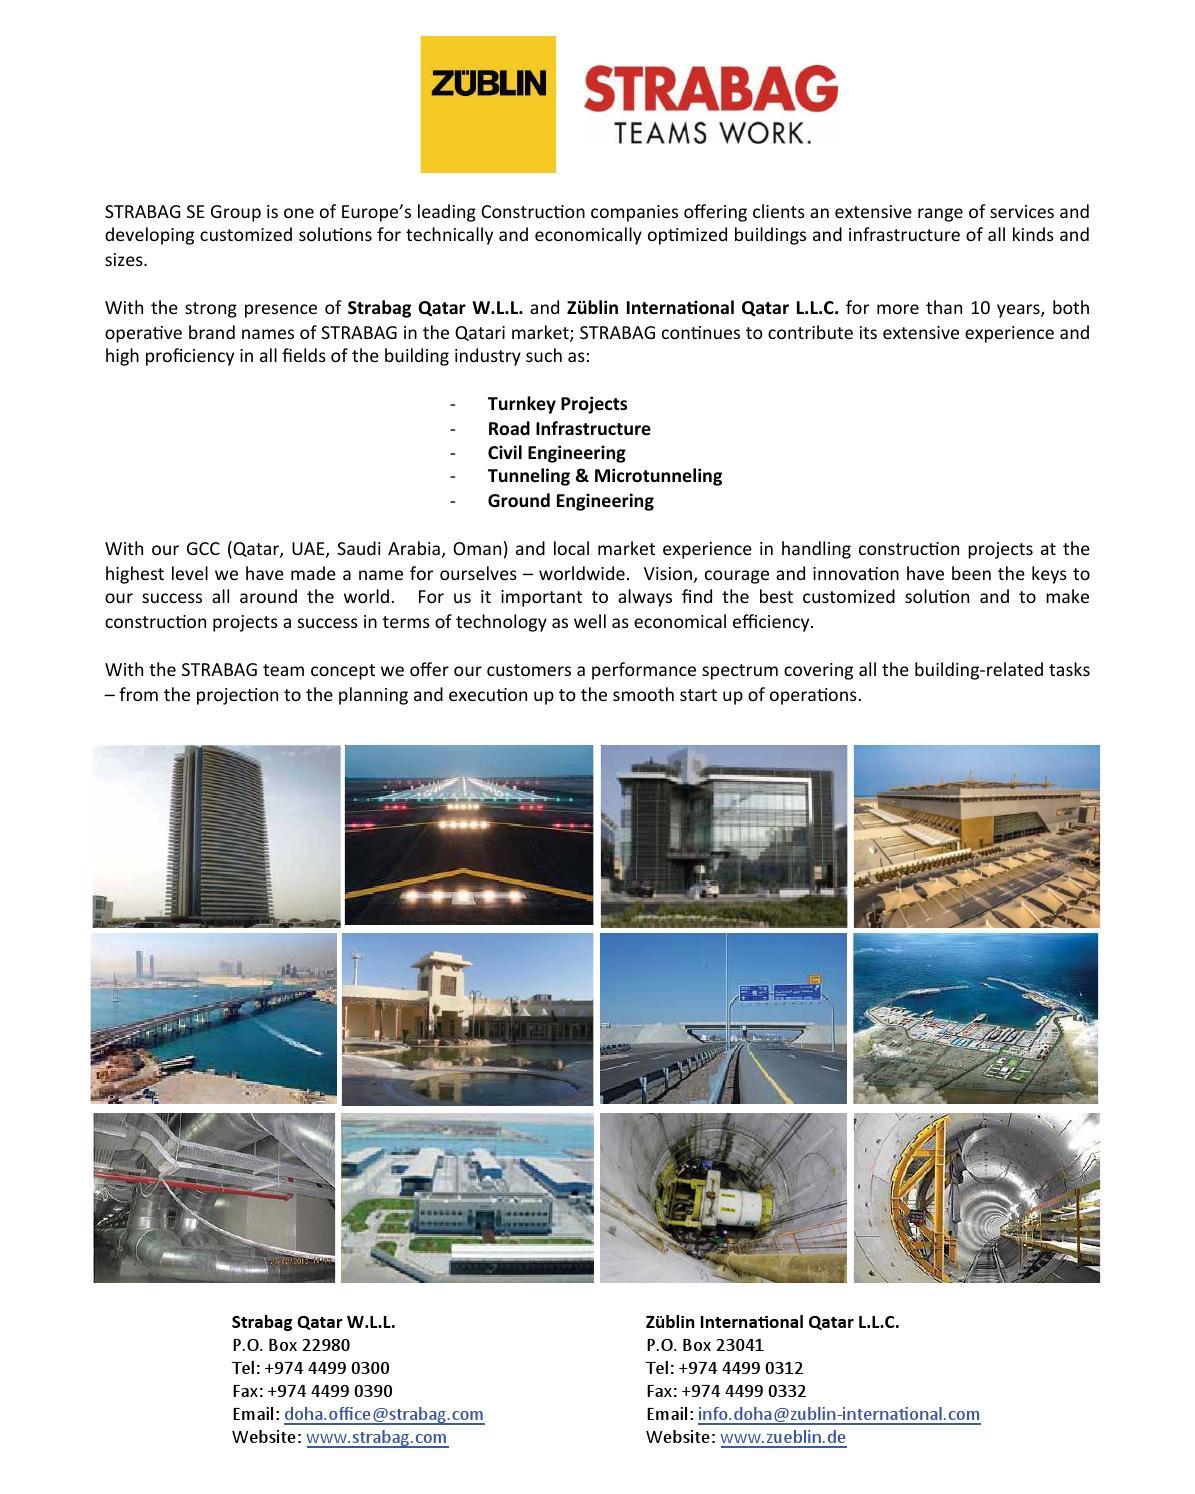 Doha Marine Services